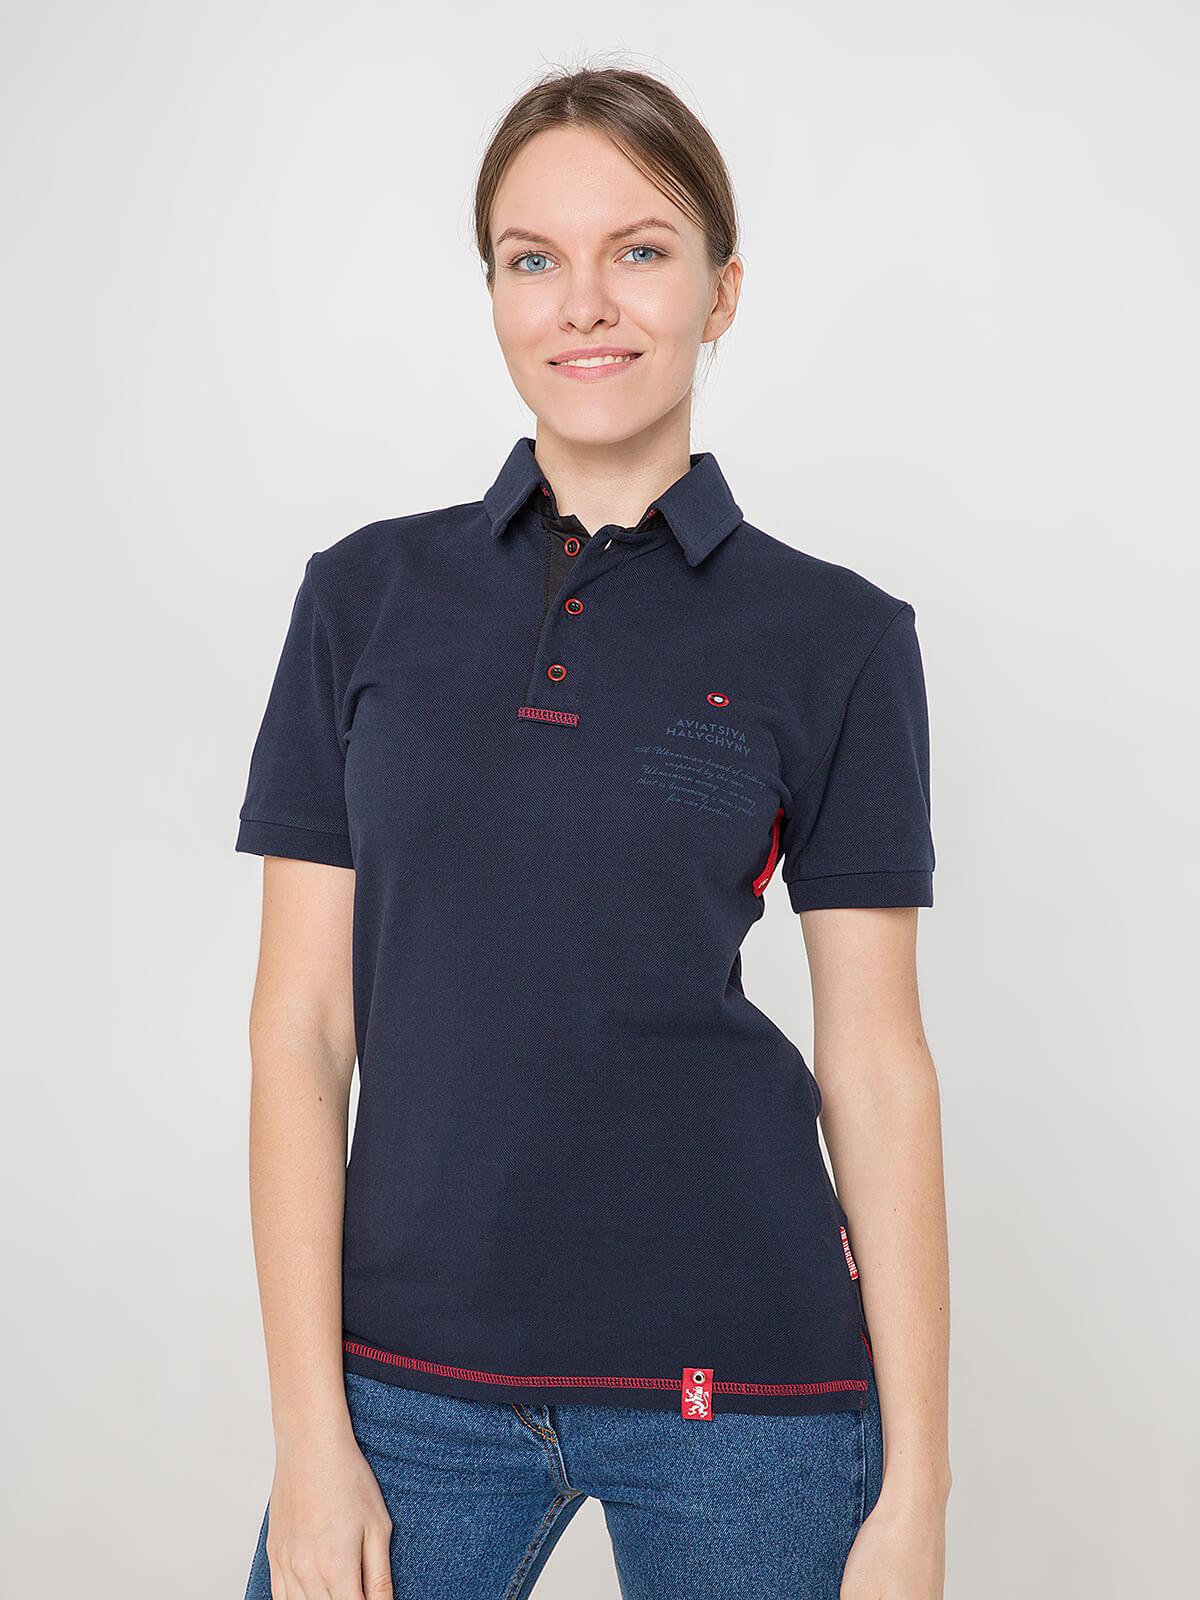 Women's Polo Shirt Wings. Color dark blue. Unisex polo (men's sizes).